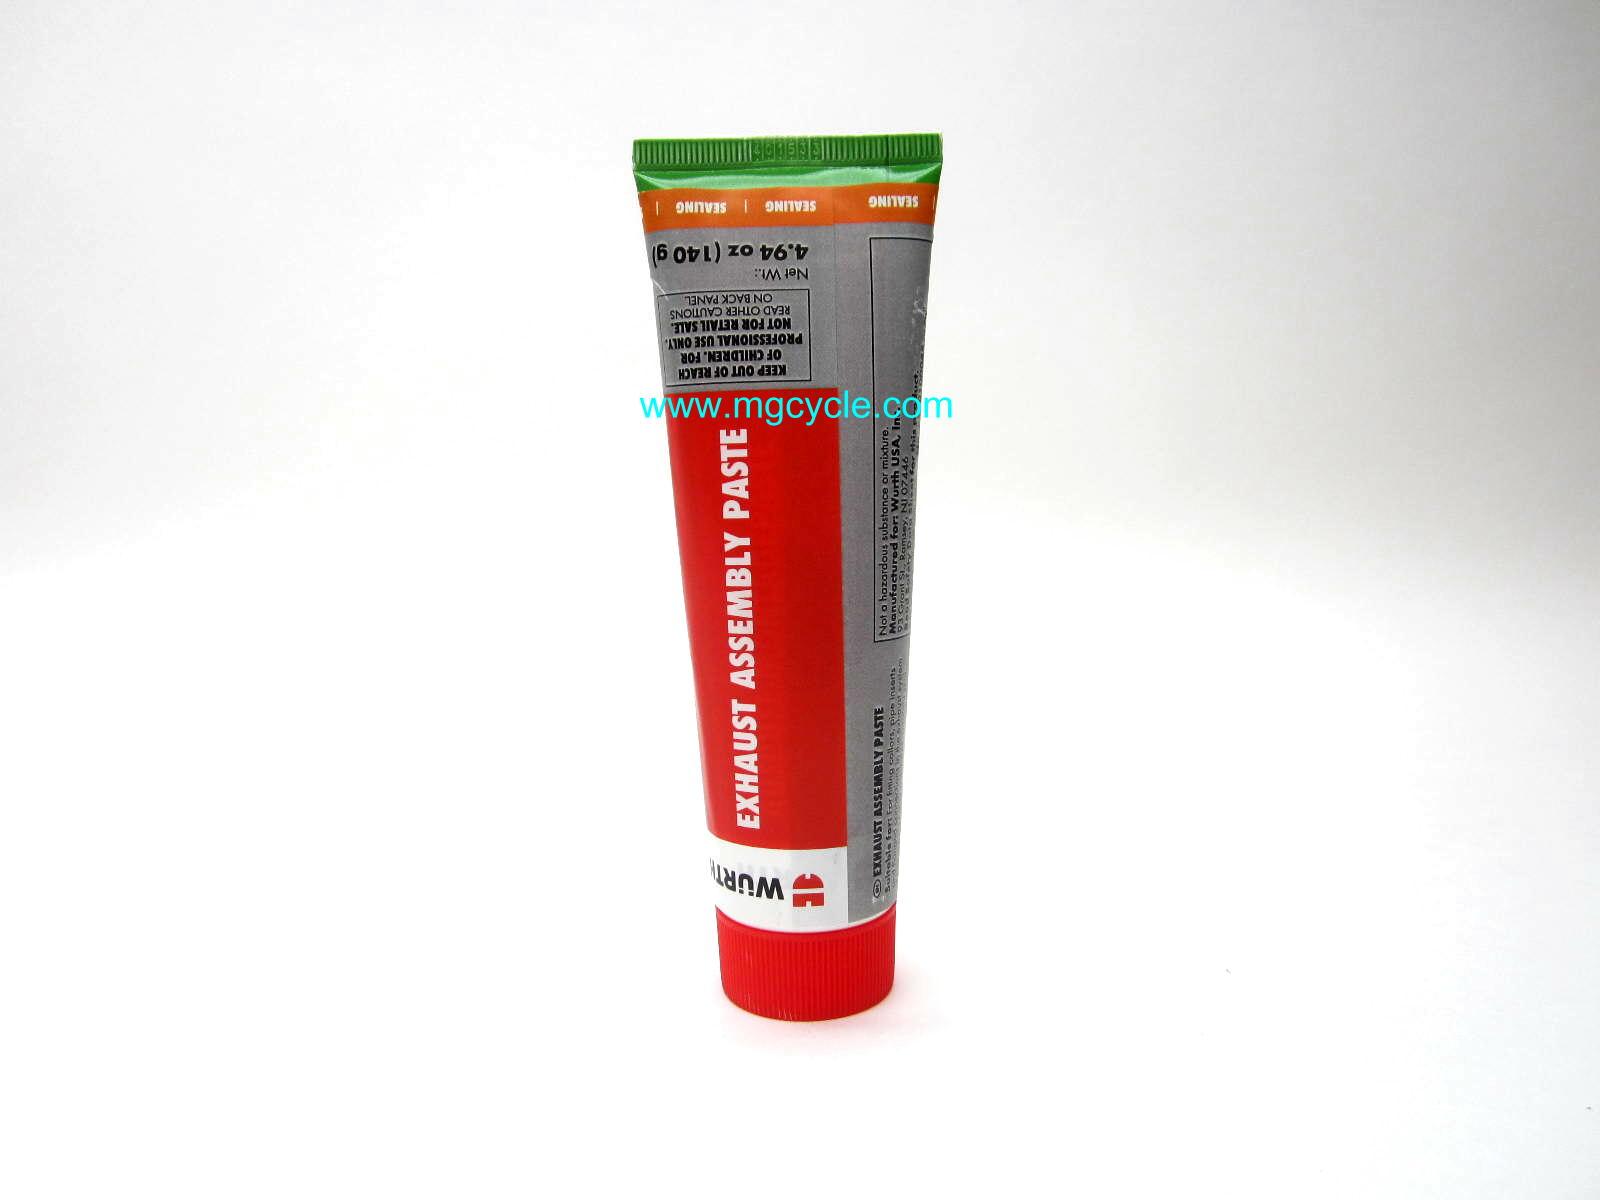 Harga Jual Aspira 12 Dot3 301 Brake Fluid Dot 3 Super Heavy Duty Seiken Minyak Rem Netral Merah 1 Liter Chemicals Mg Cycle Moto Guzzi Parts And Accessories Available